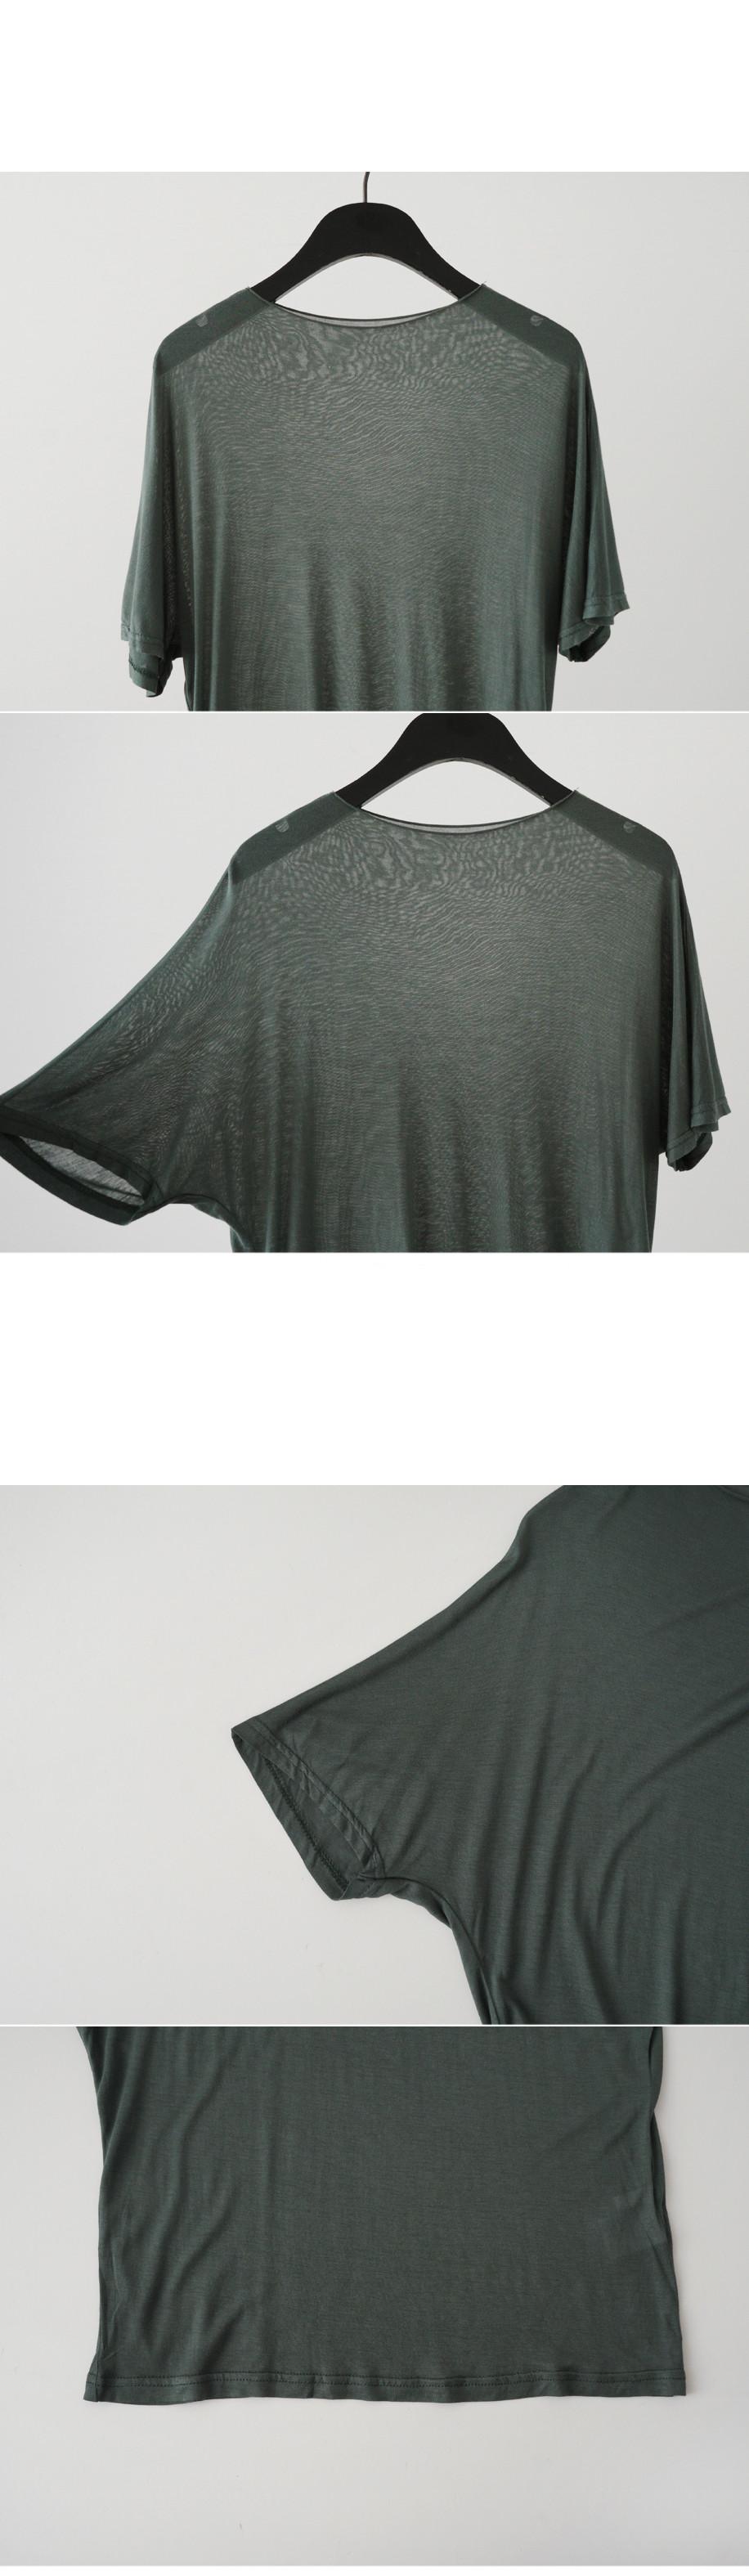 neckline natural wave top